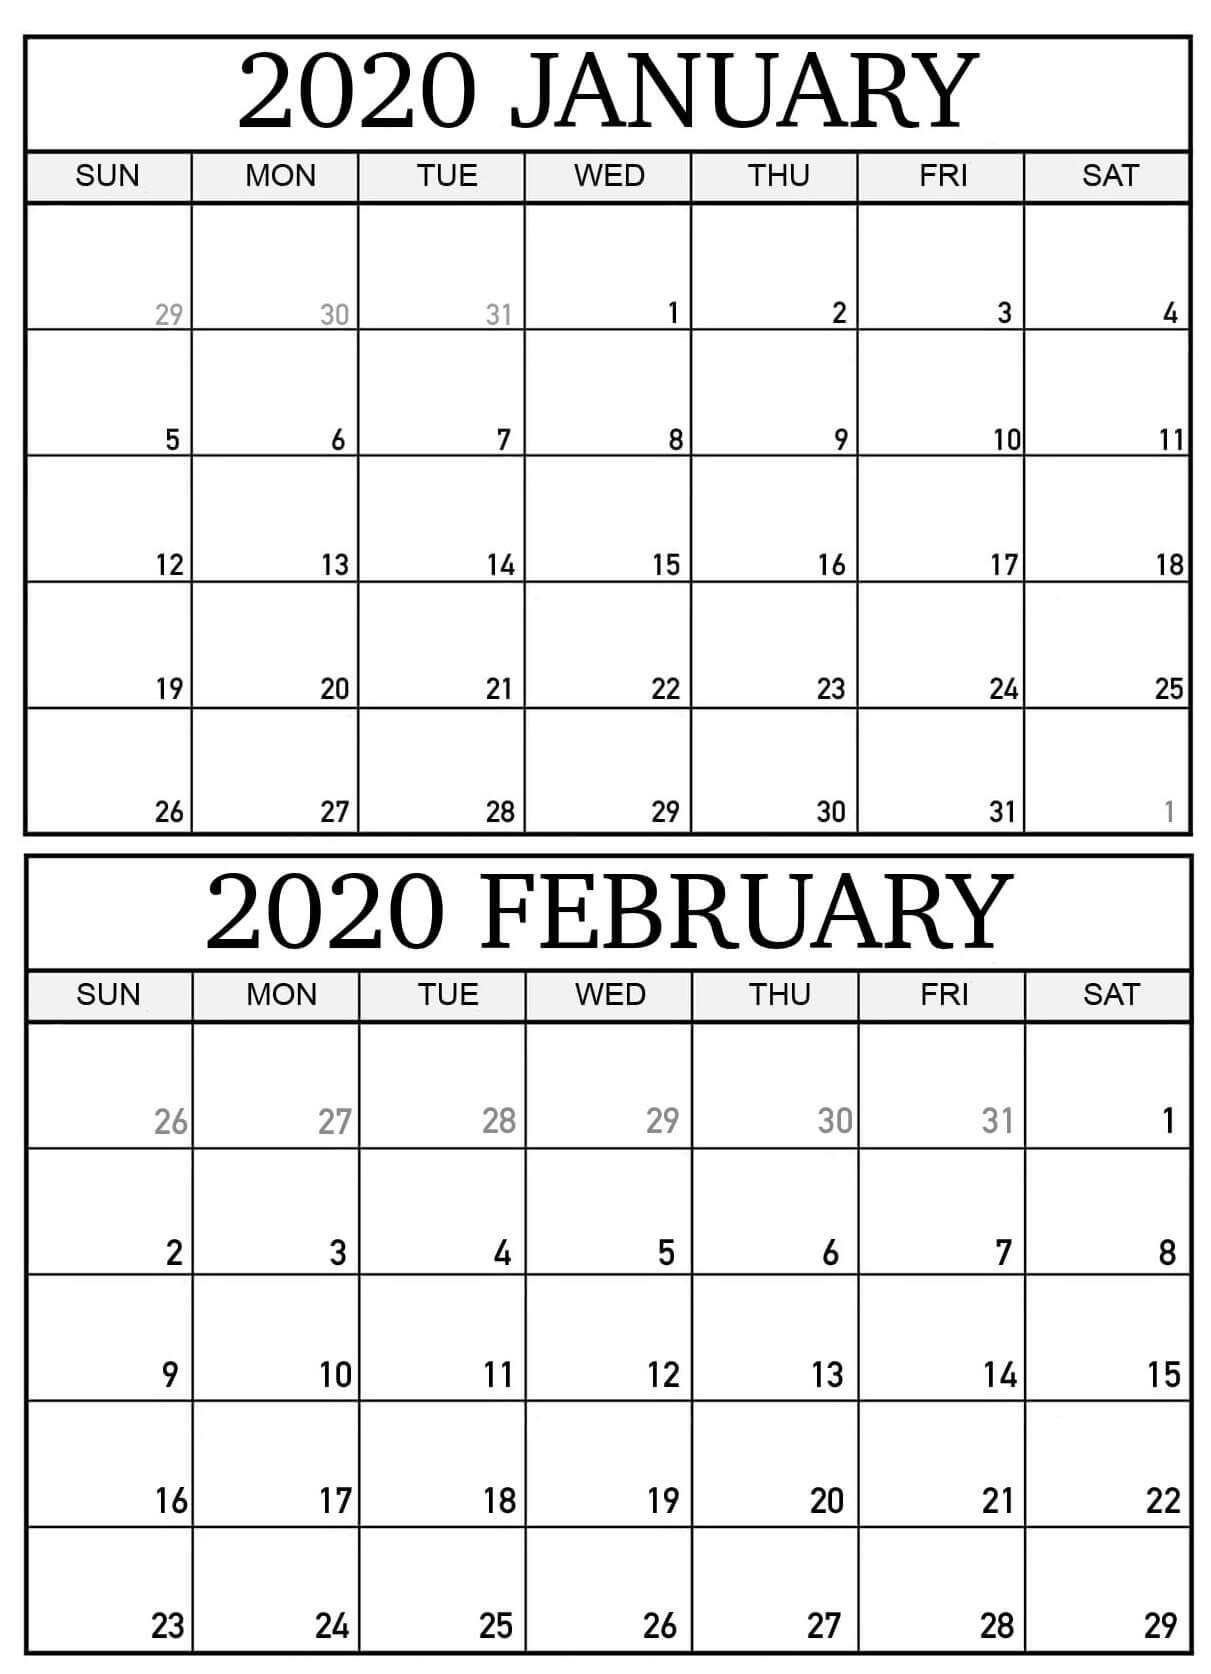 Printable February 2020 Calendar Word - Blank 2020 January